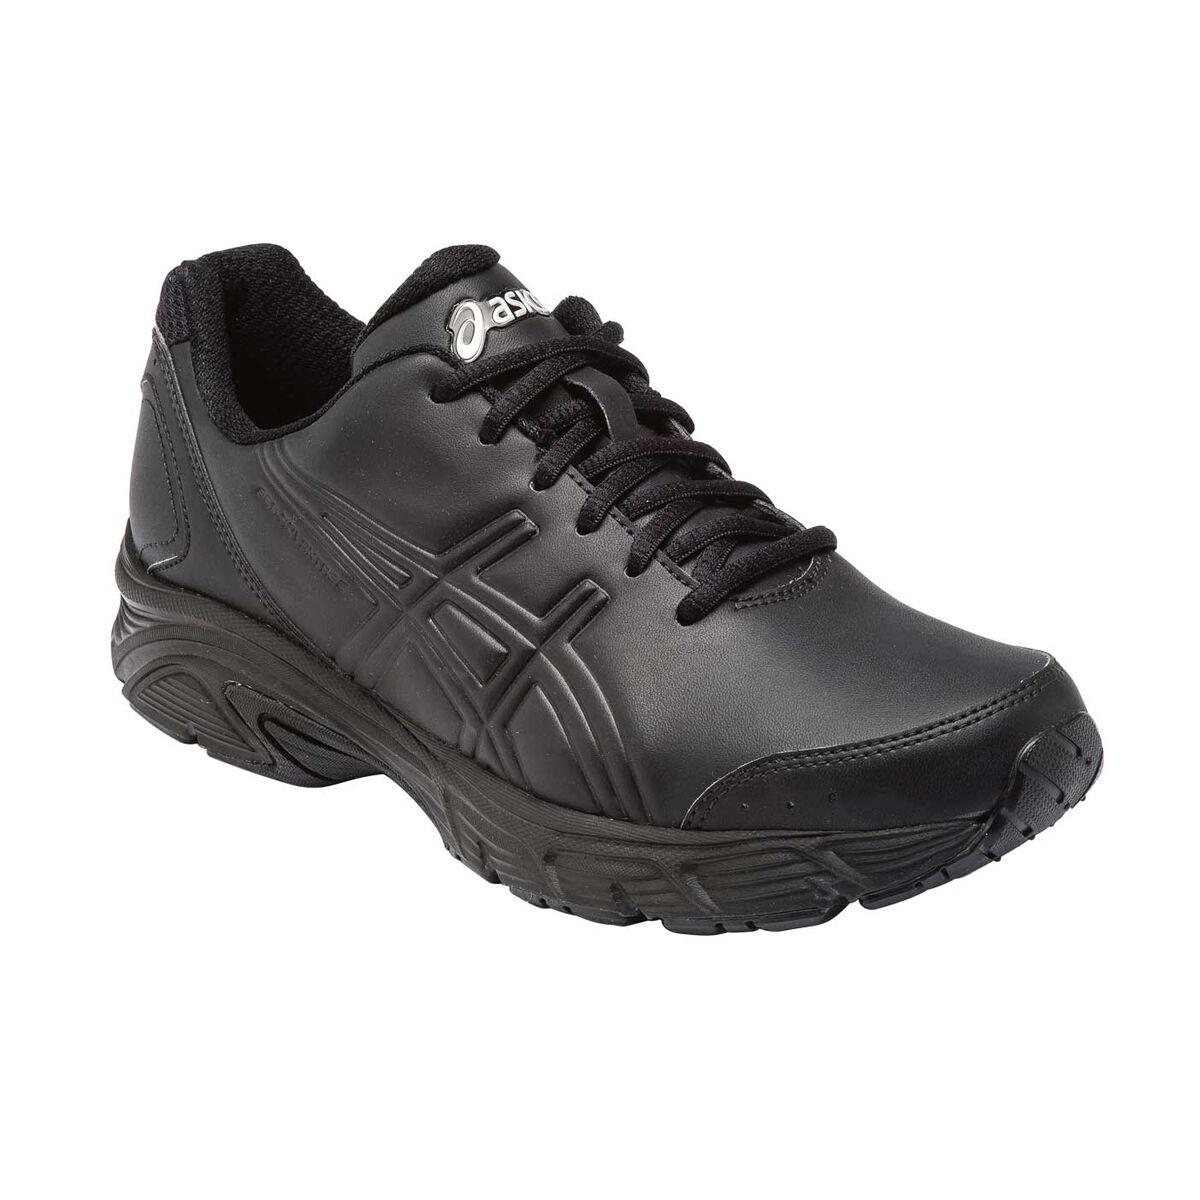 Asics Gel Advantage 3 Mens Walking Shoes Black US 11